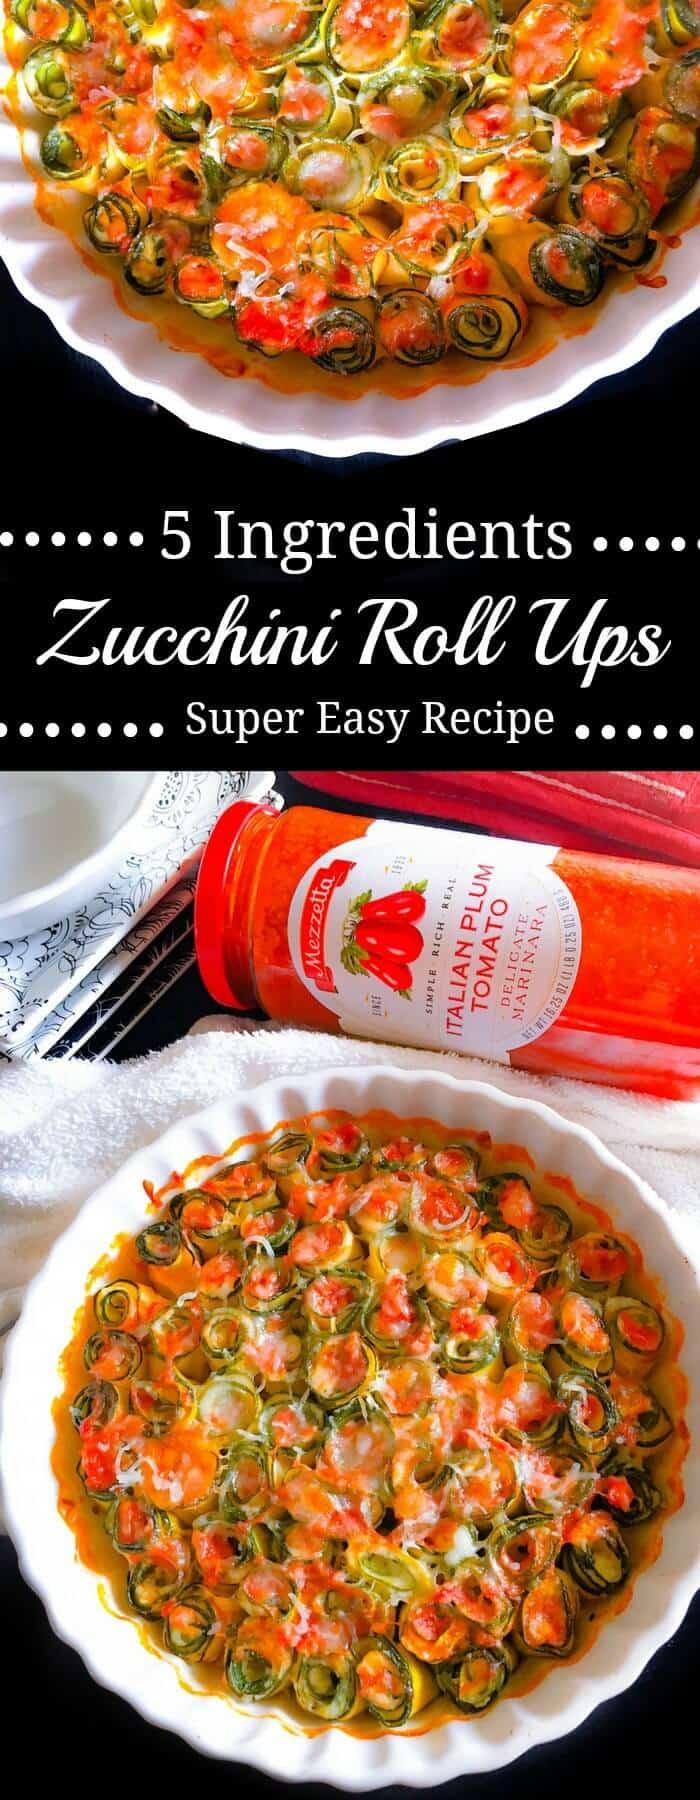 5 Ingredients Zucchini Roll Ups : #ad #TheStoryofSauce #Mezzetta #zucchini #rollups